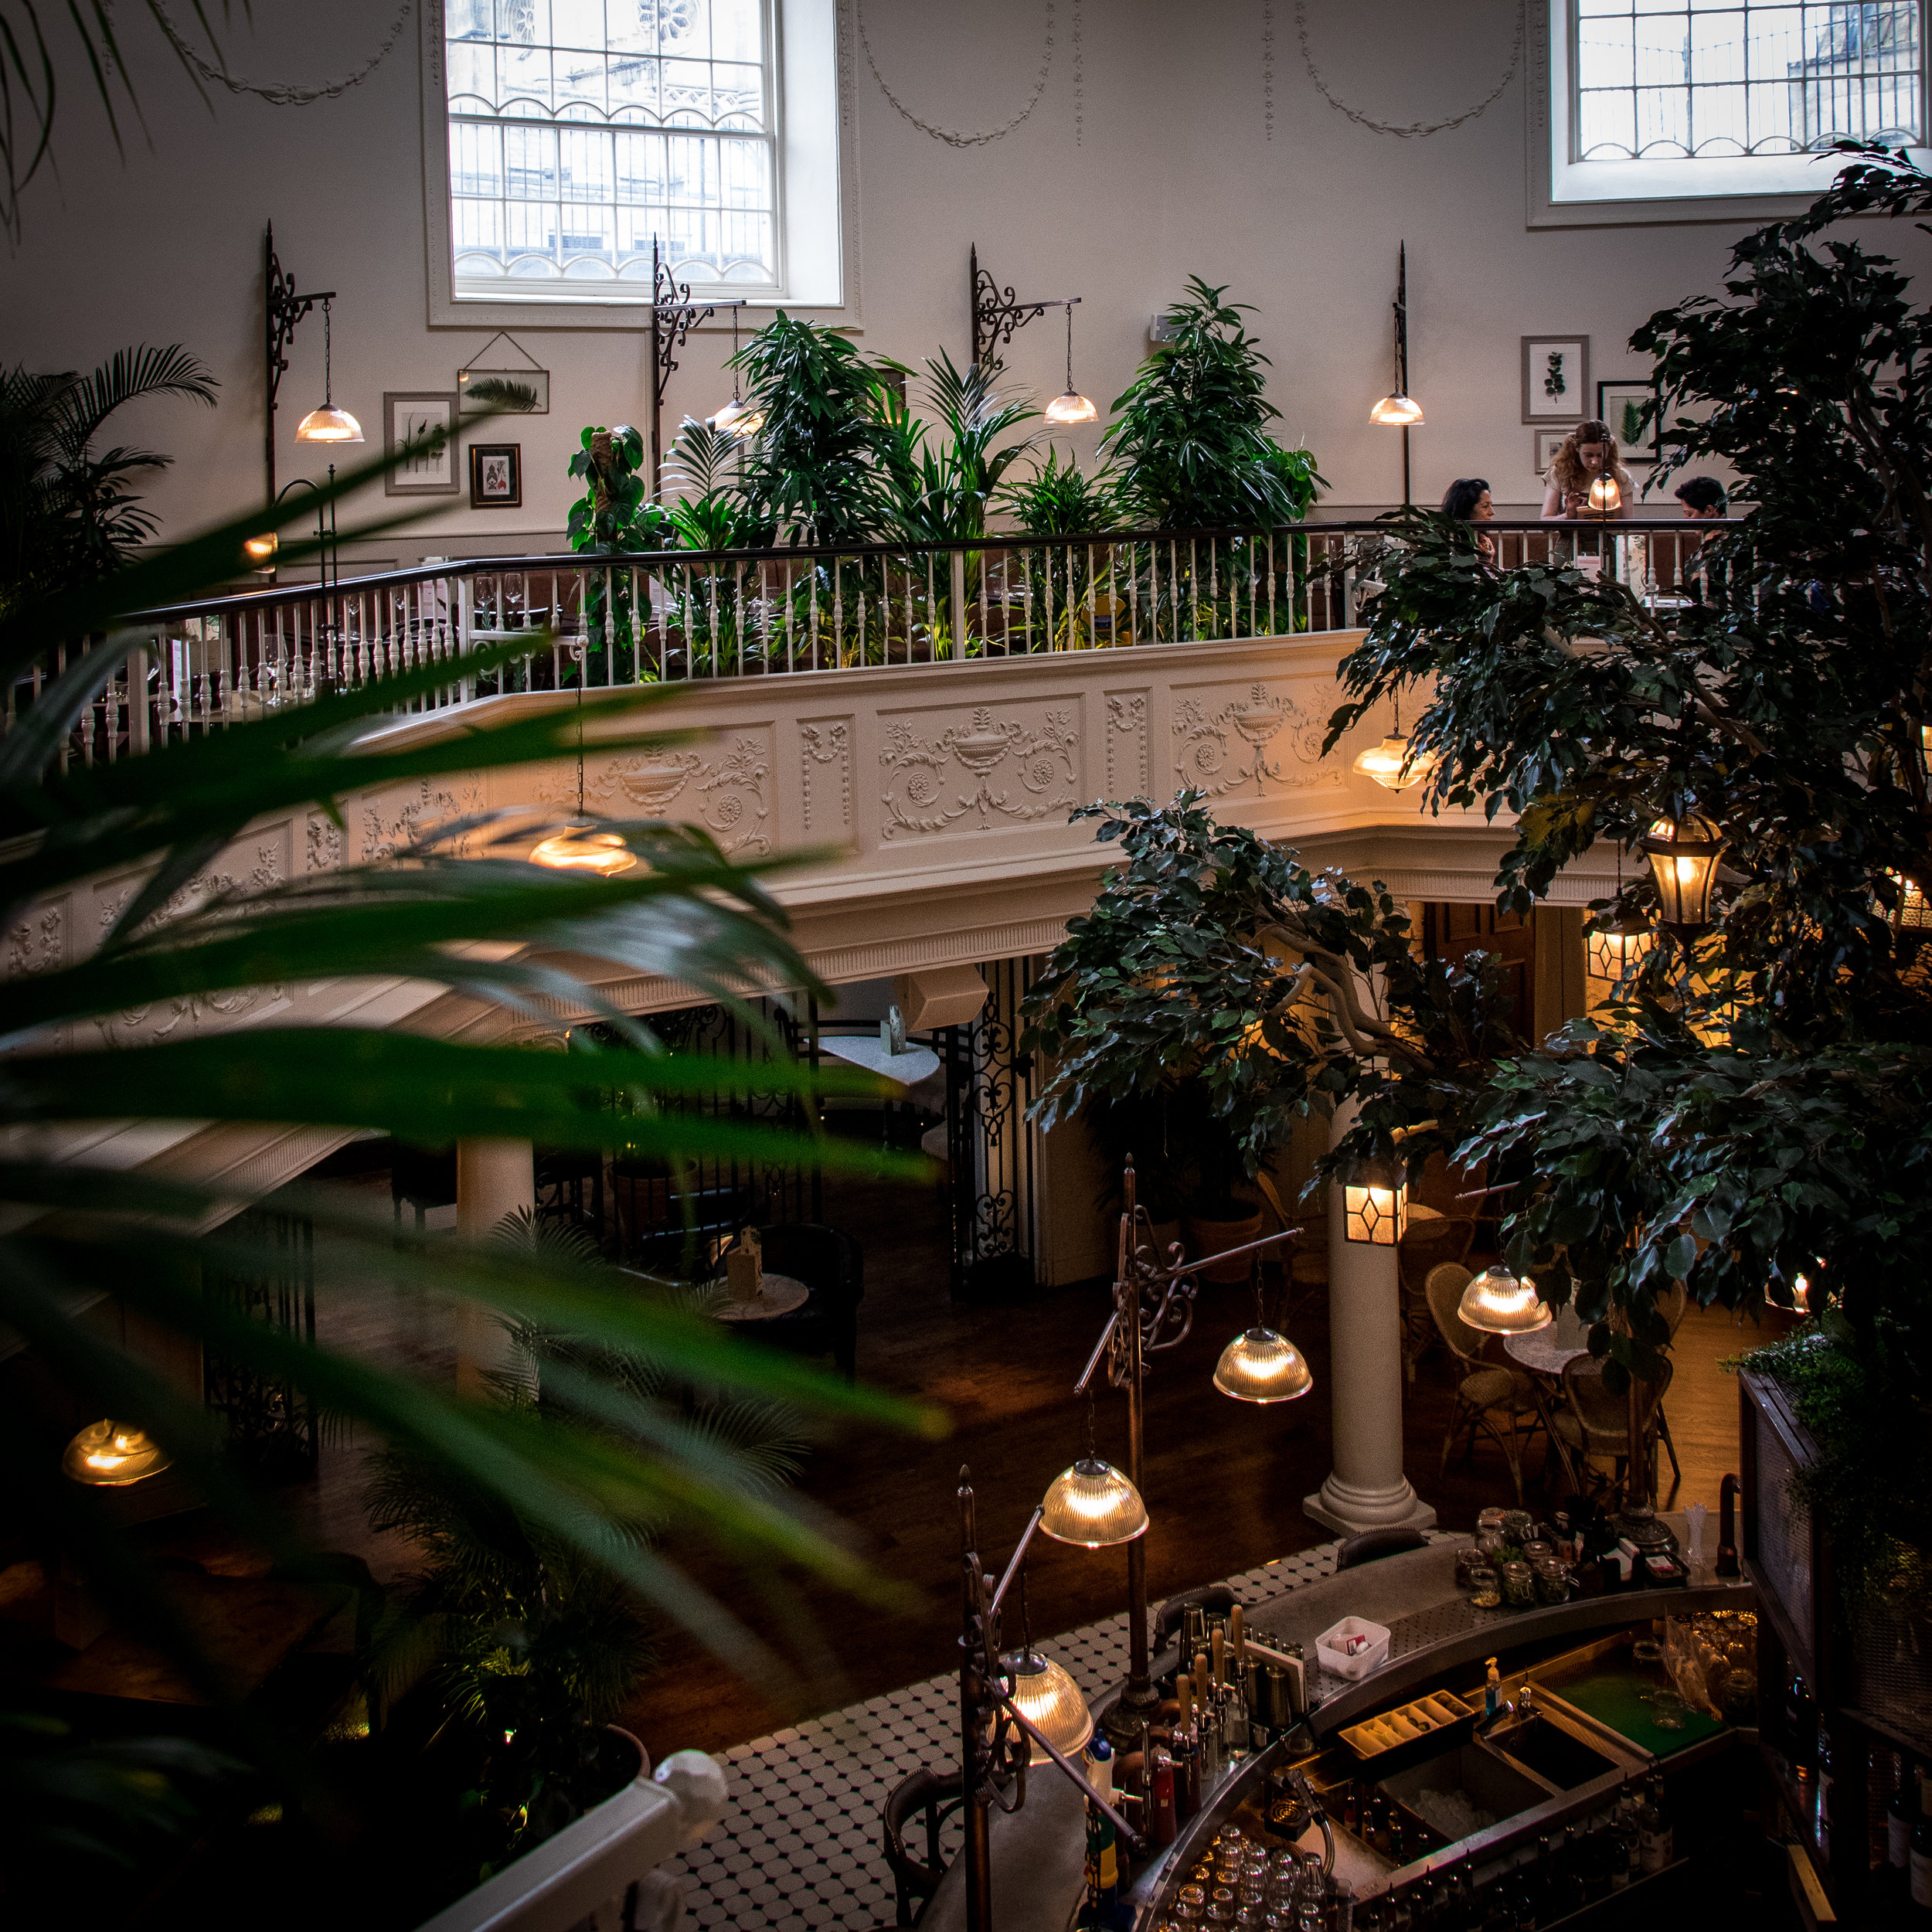 The Botanist Bath